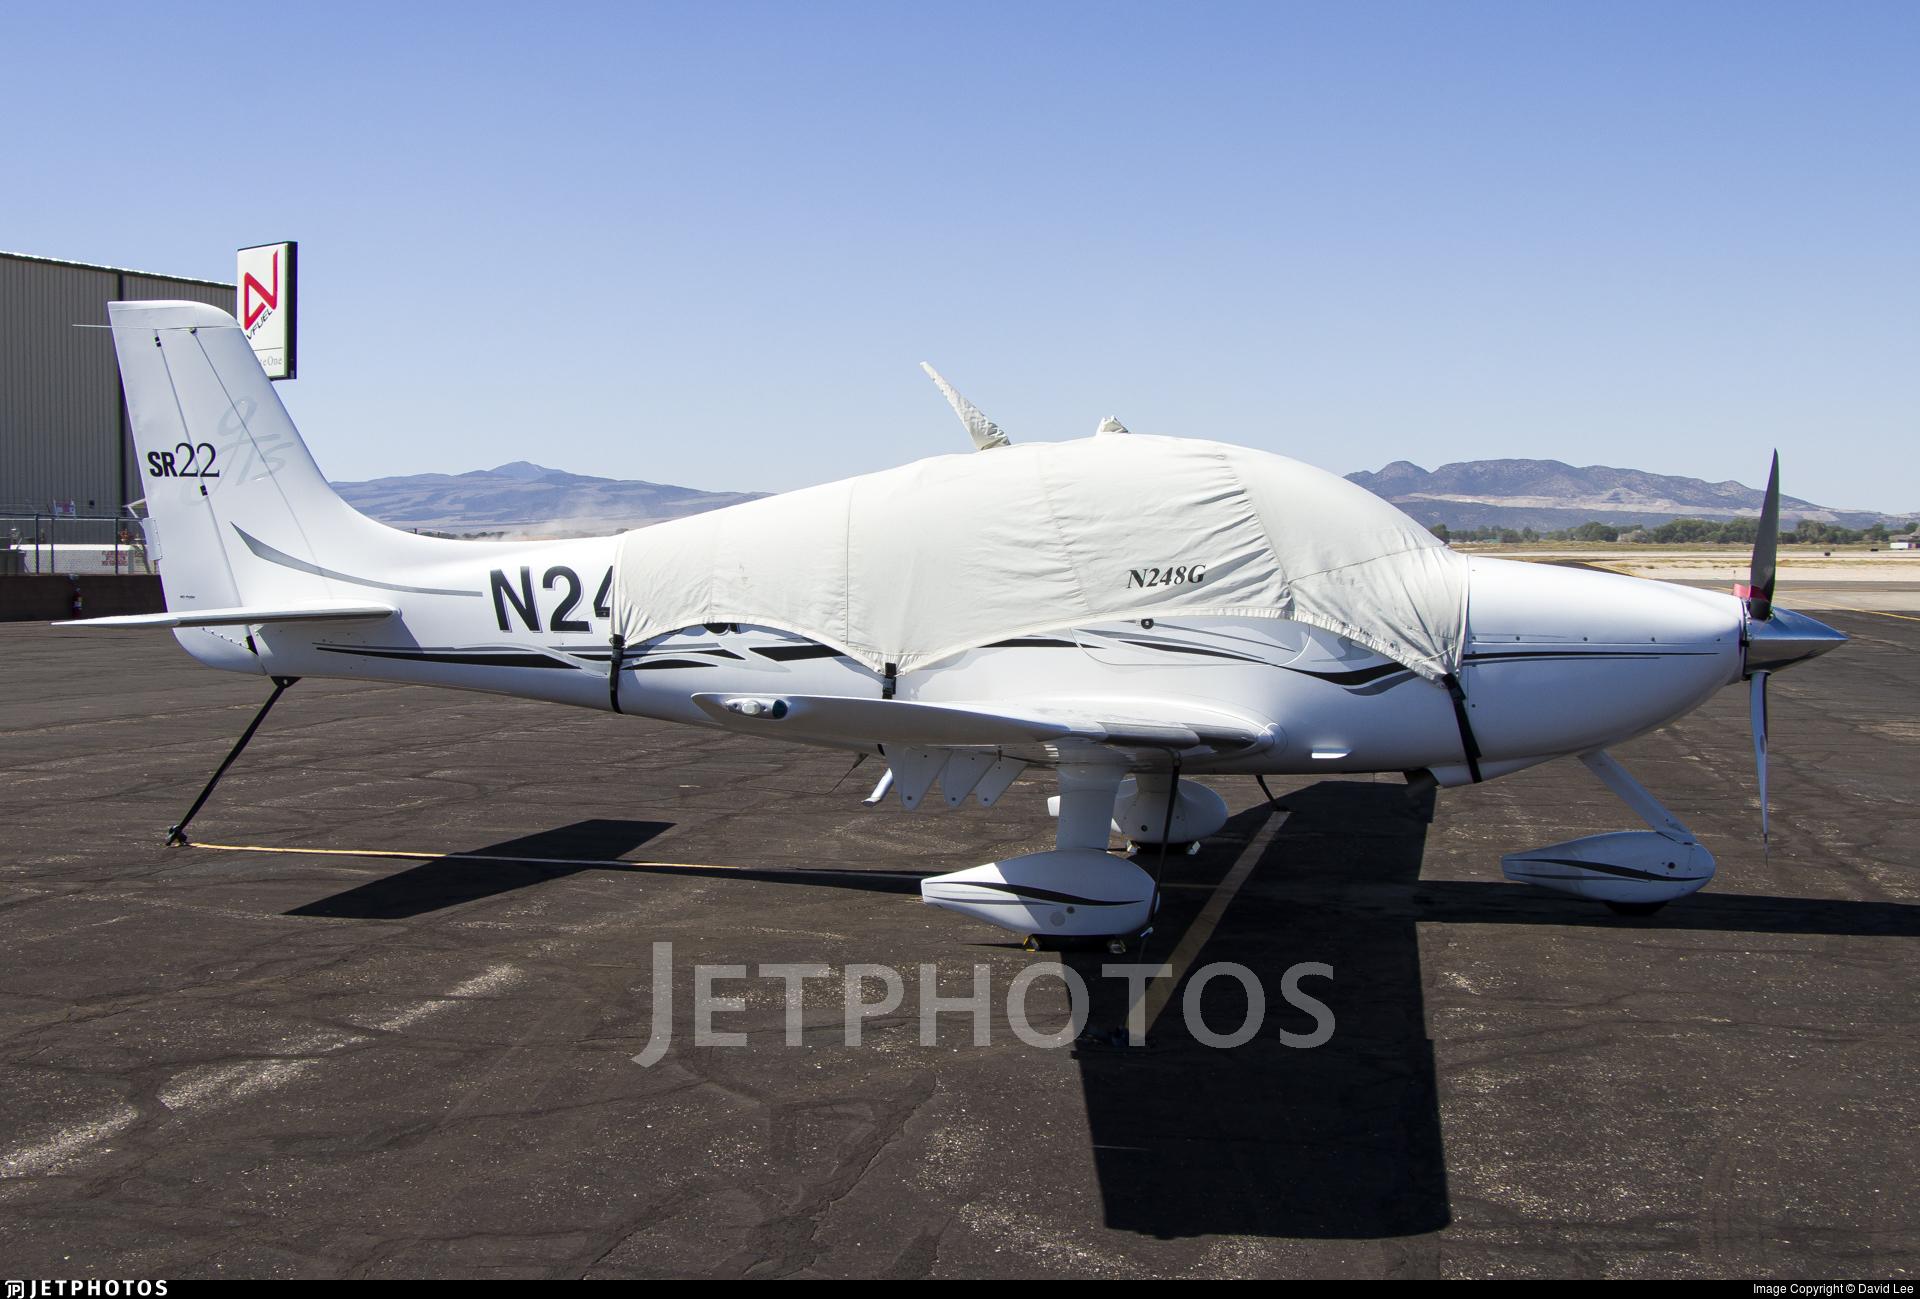 N248G - Cirrus SR22-GTS - Halo Aviation